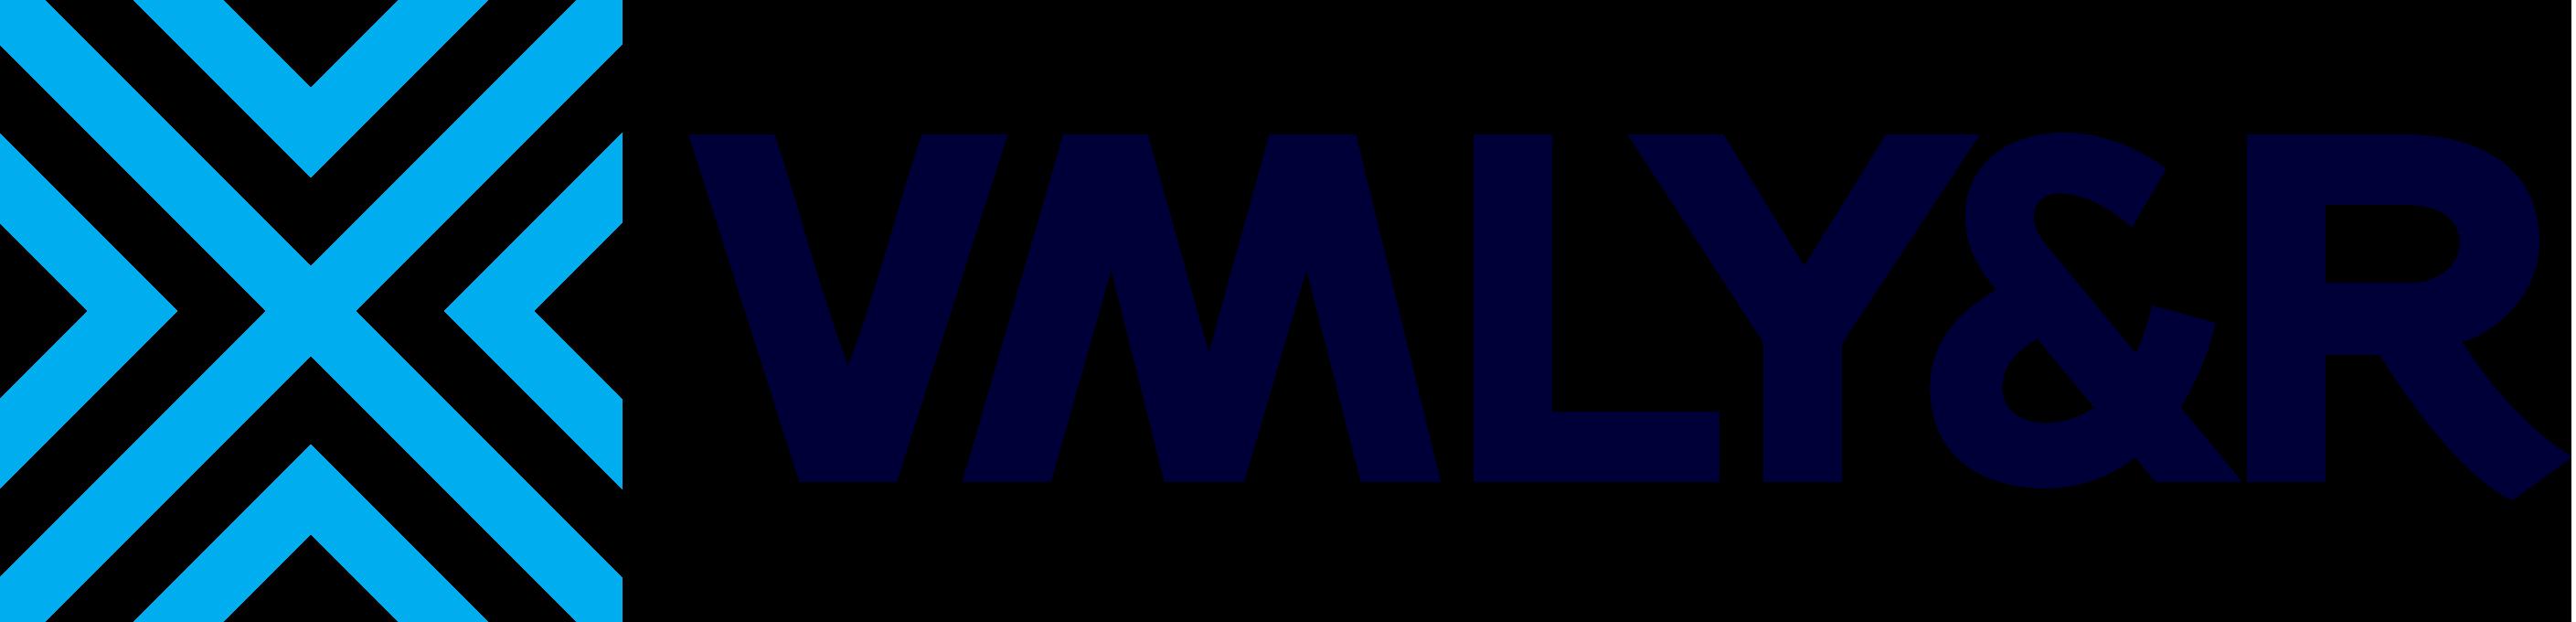 VMLY&R - Branding- und Design